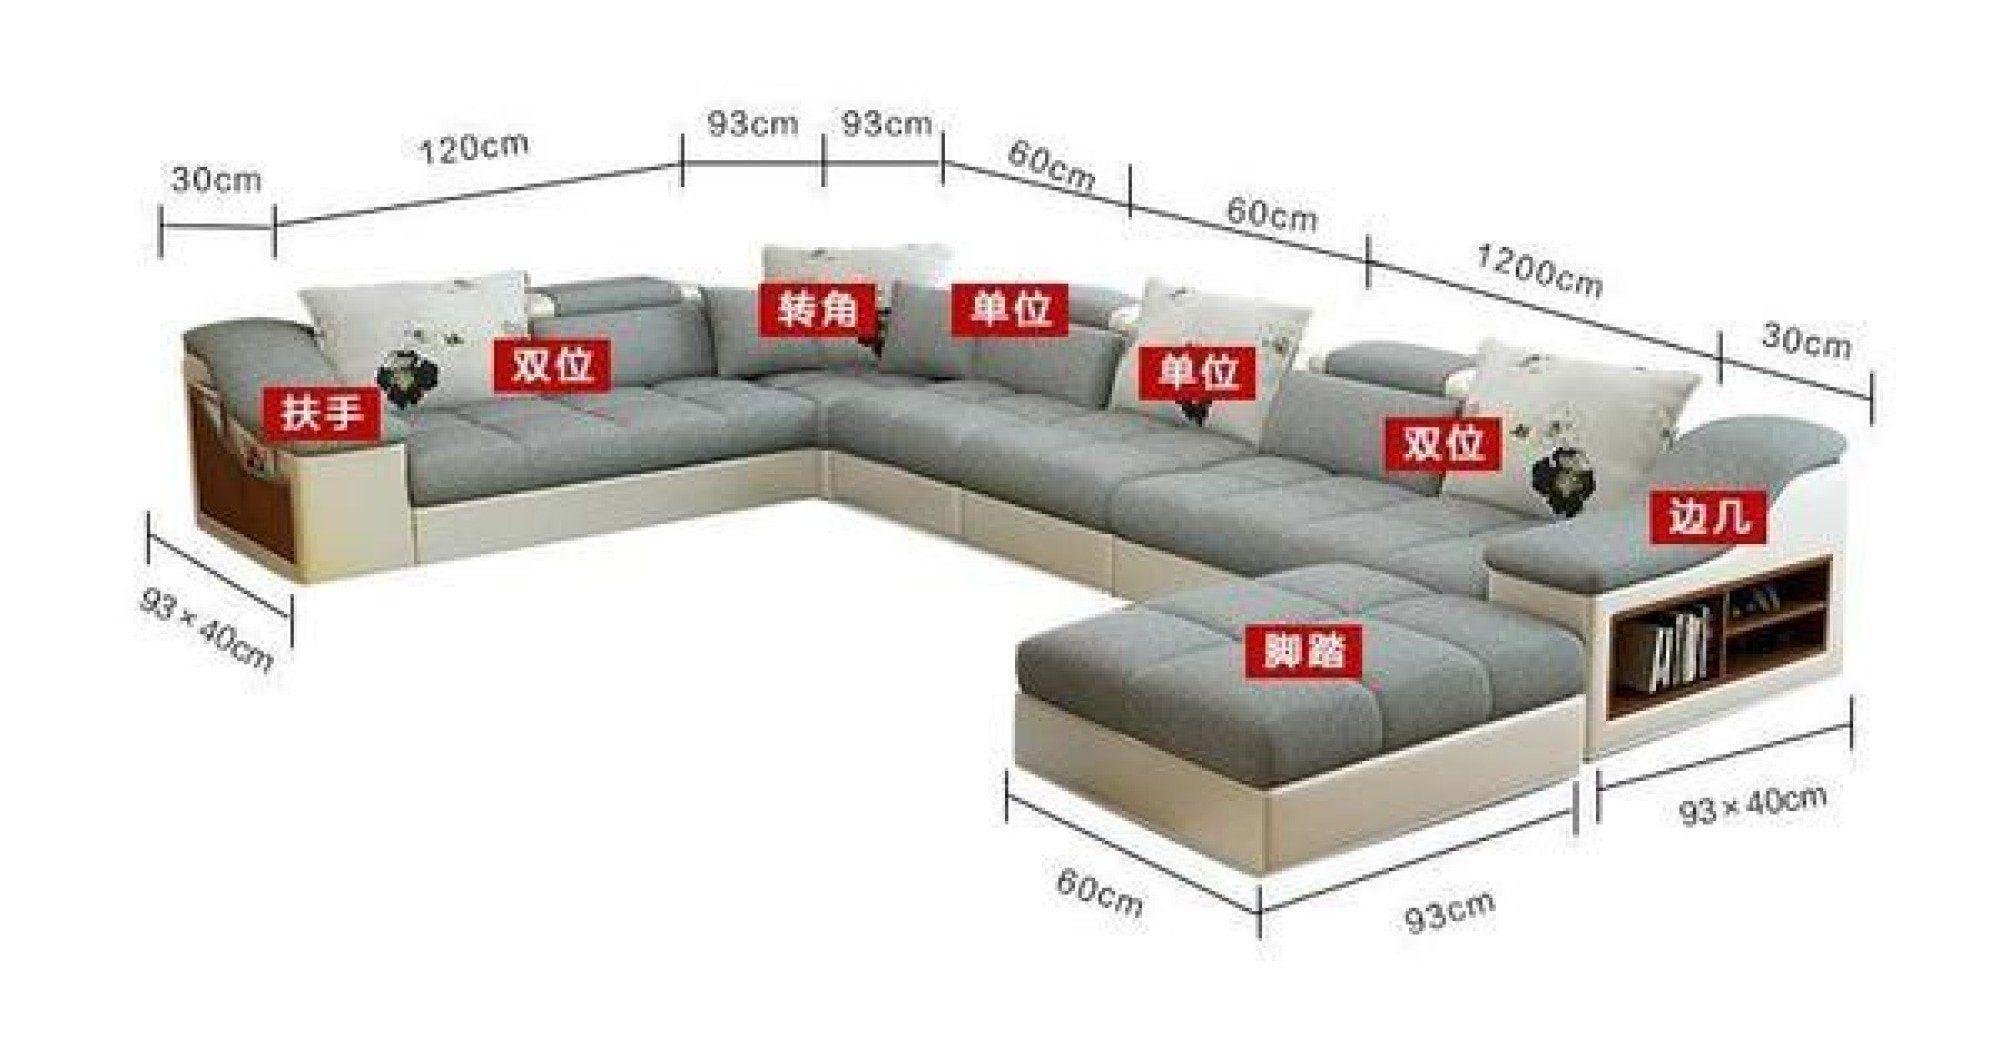 Luxury Modern U Shaped Leather Fabric Corner Sectional Sofa Set Design My Aashis U Shaped Sectional Sofa Corner Sectional Sofa Sofa Set Designs